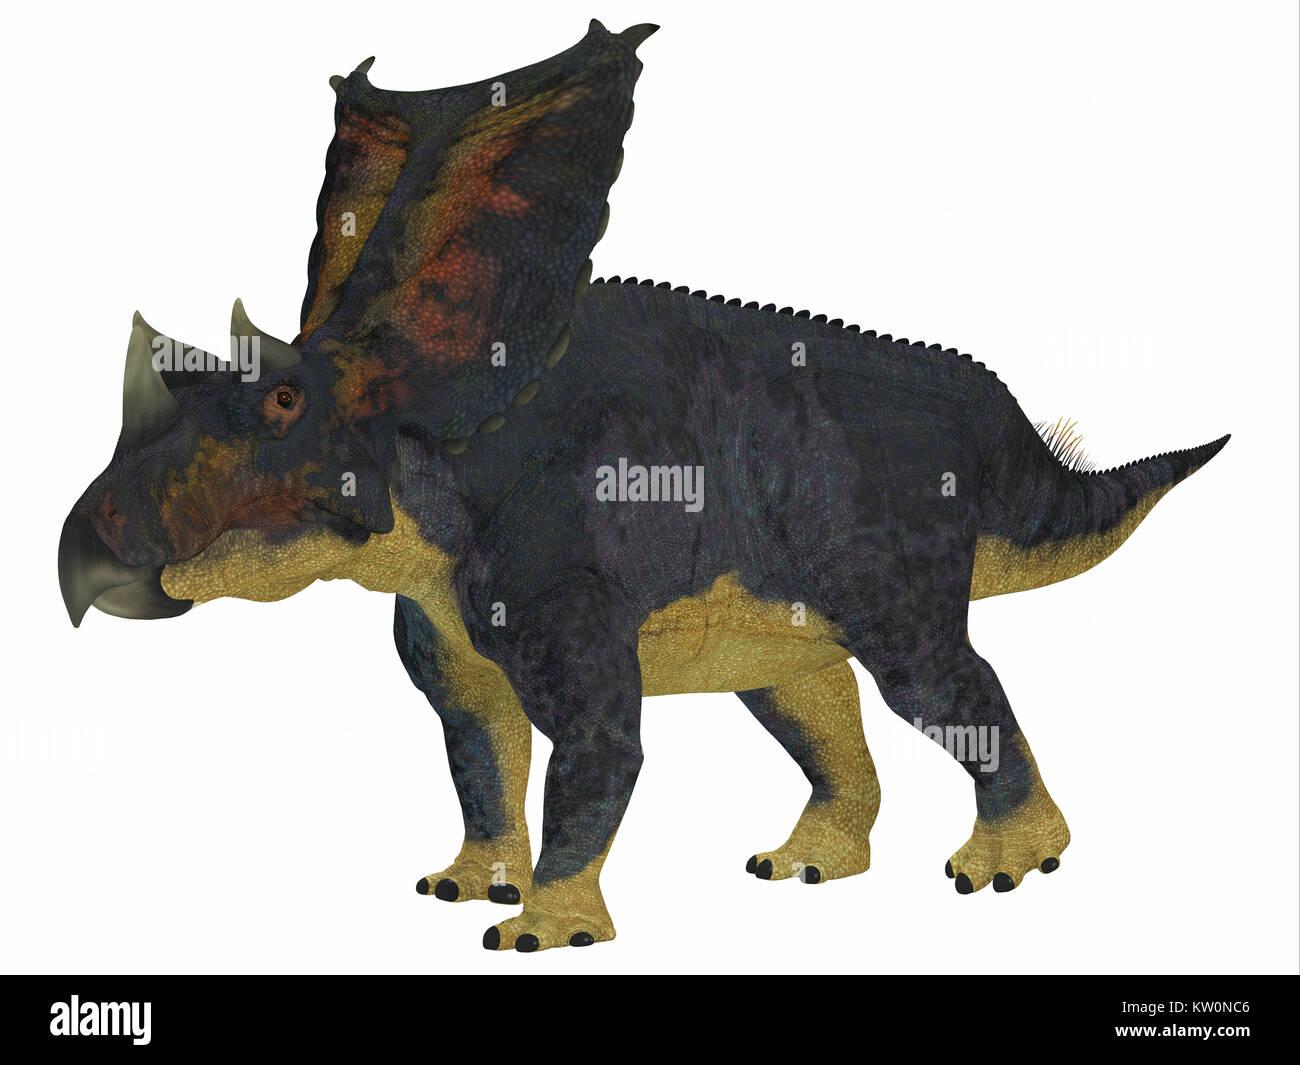 Chasmosaurus Dinosaur Side Profile - Chasmosaurus was a herbivorous ceratopsian dinosaur that lived in Alberta, - Stock Image